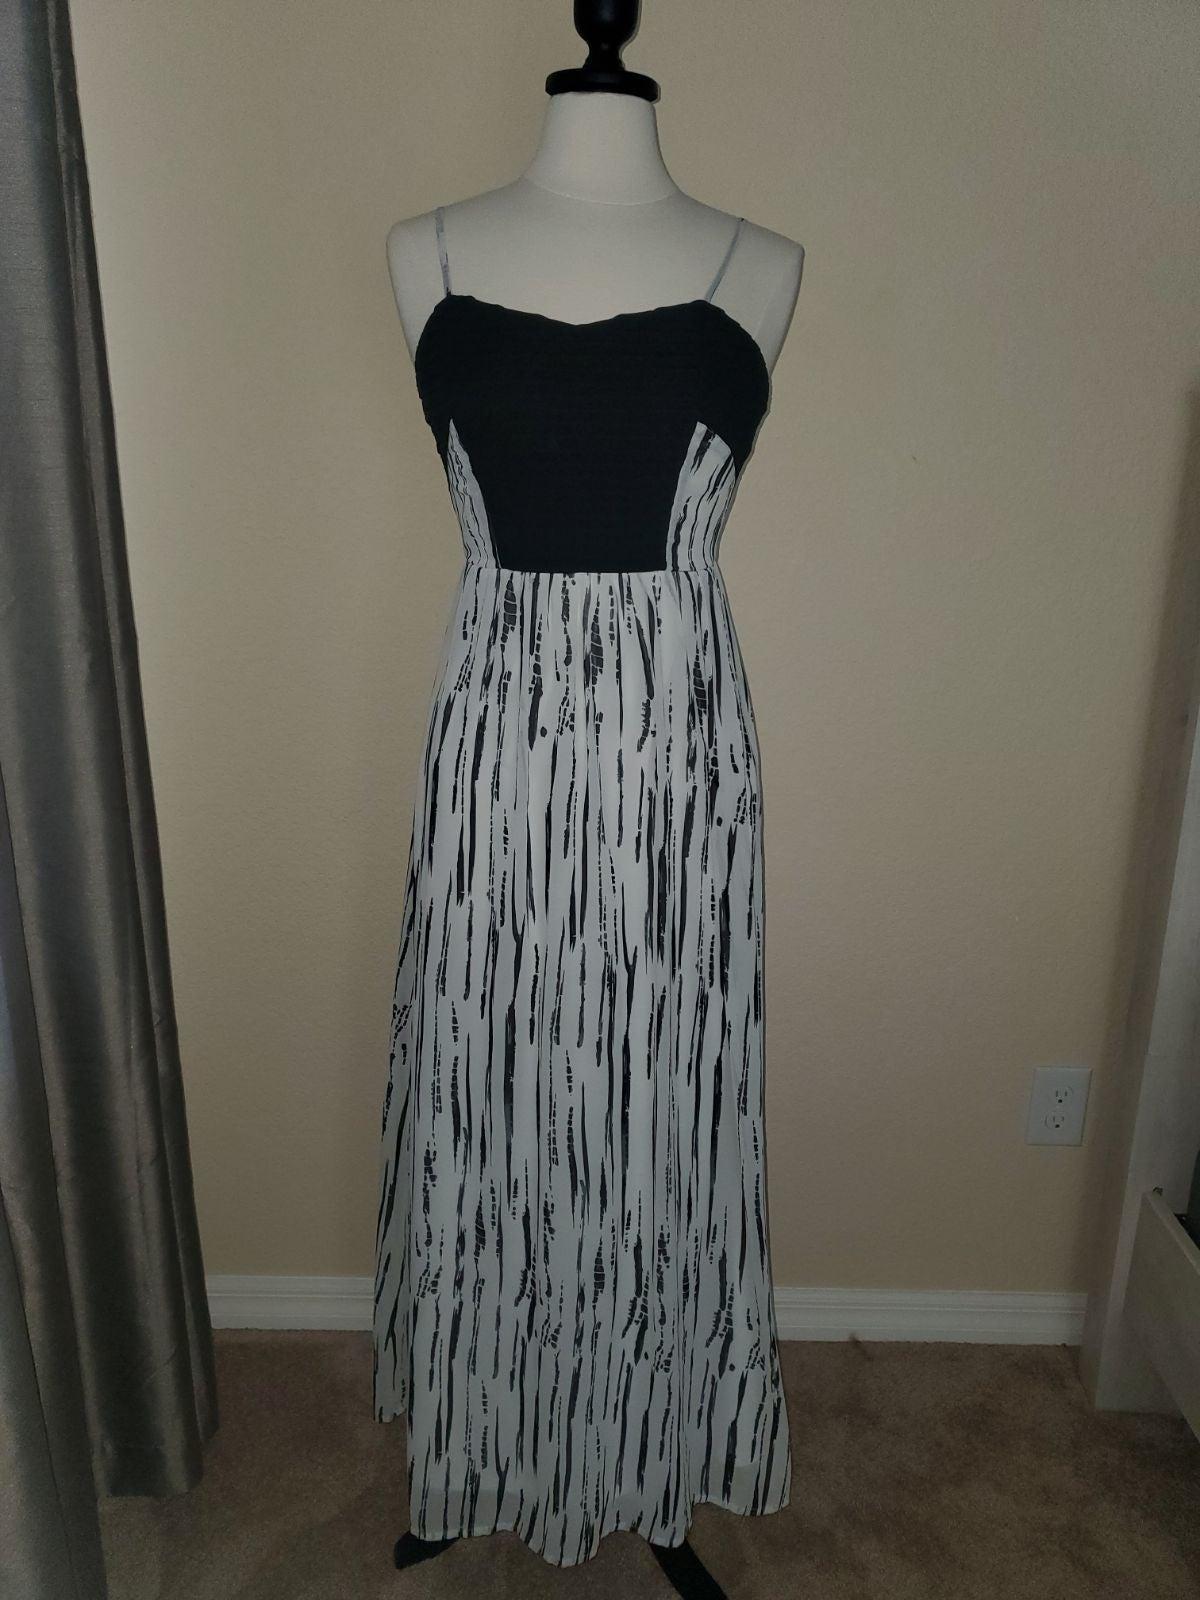 Bar III Maxi Dress size Small